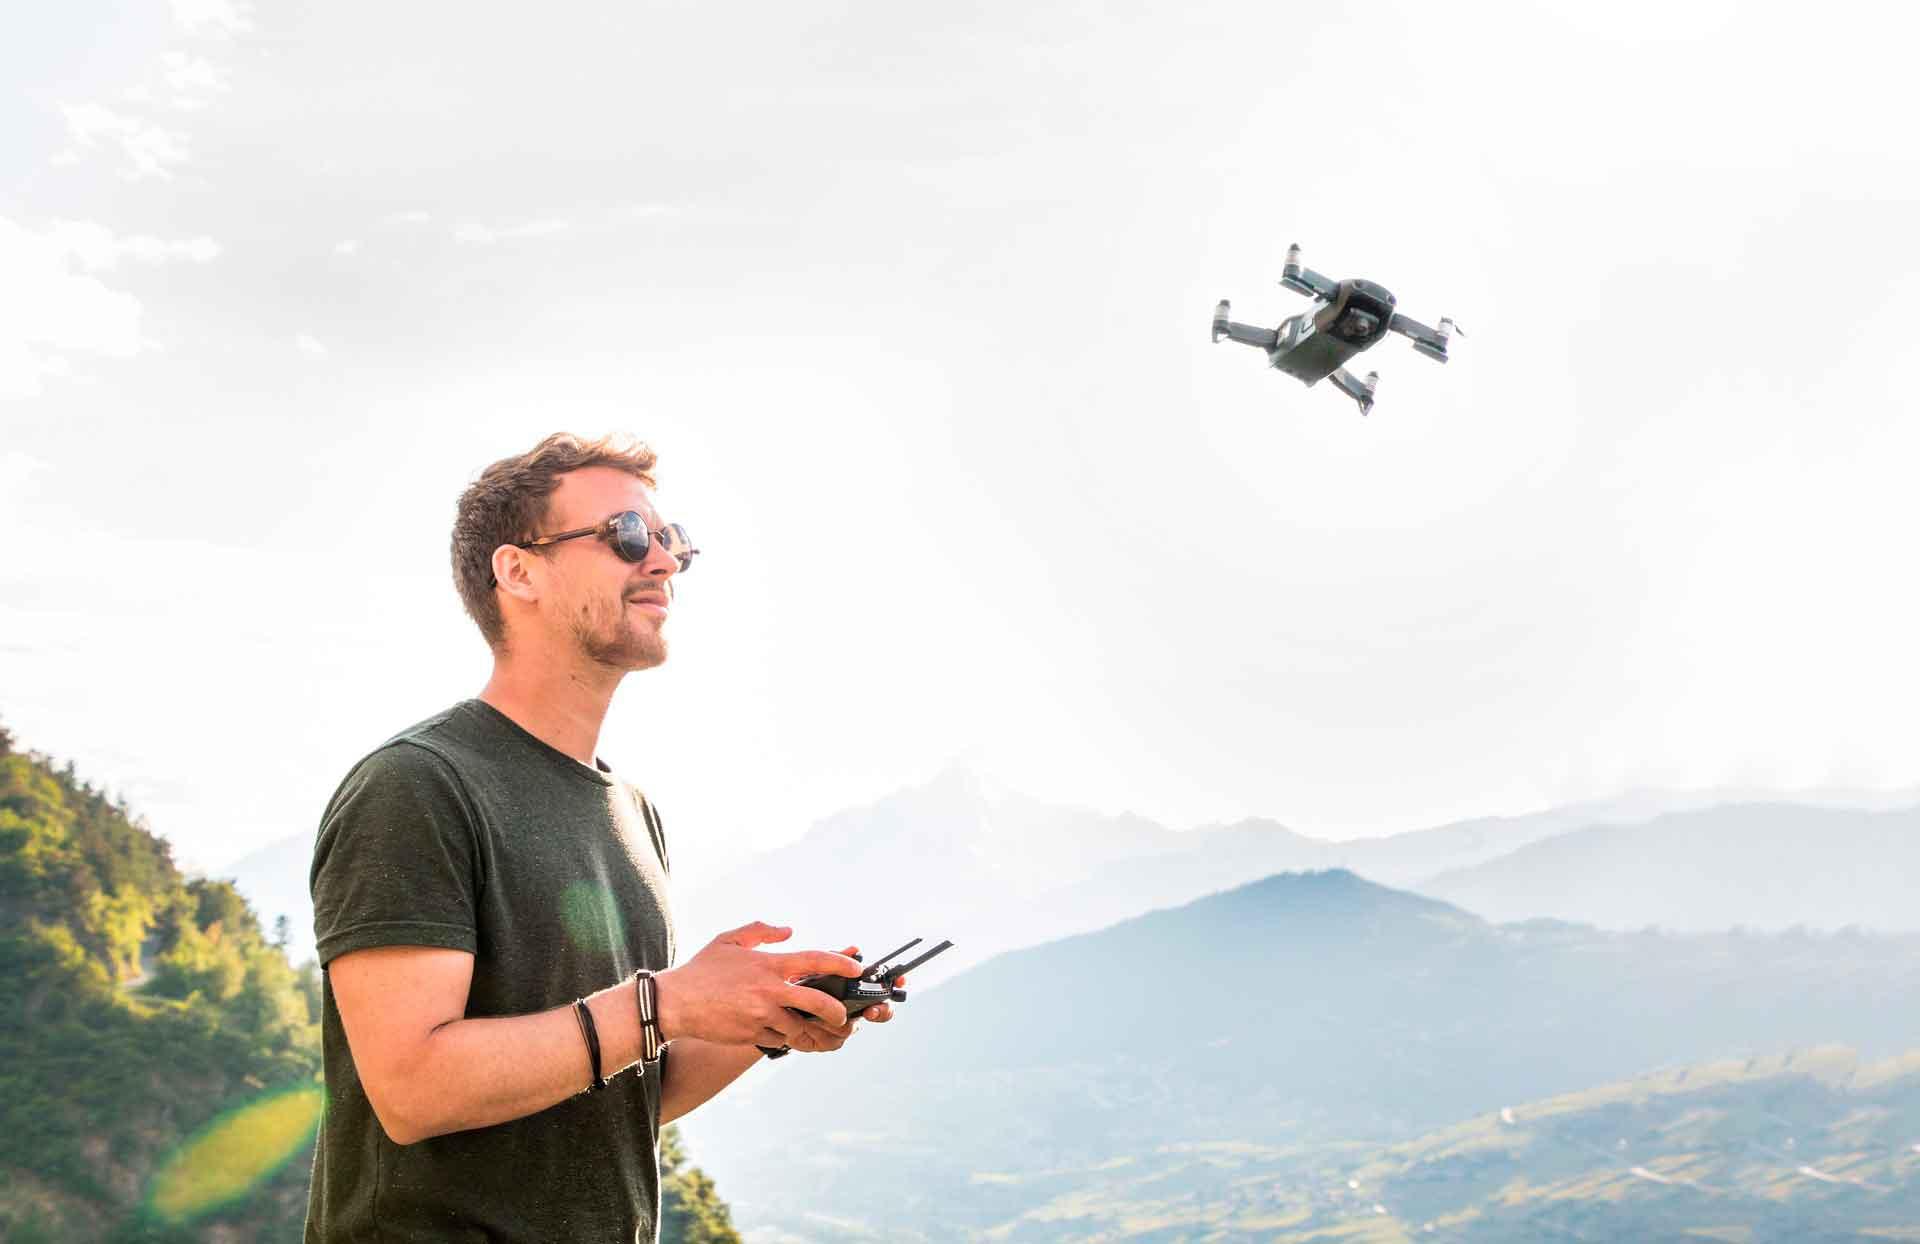 Как летают дроны? Физика.